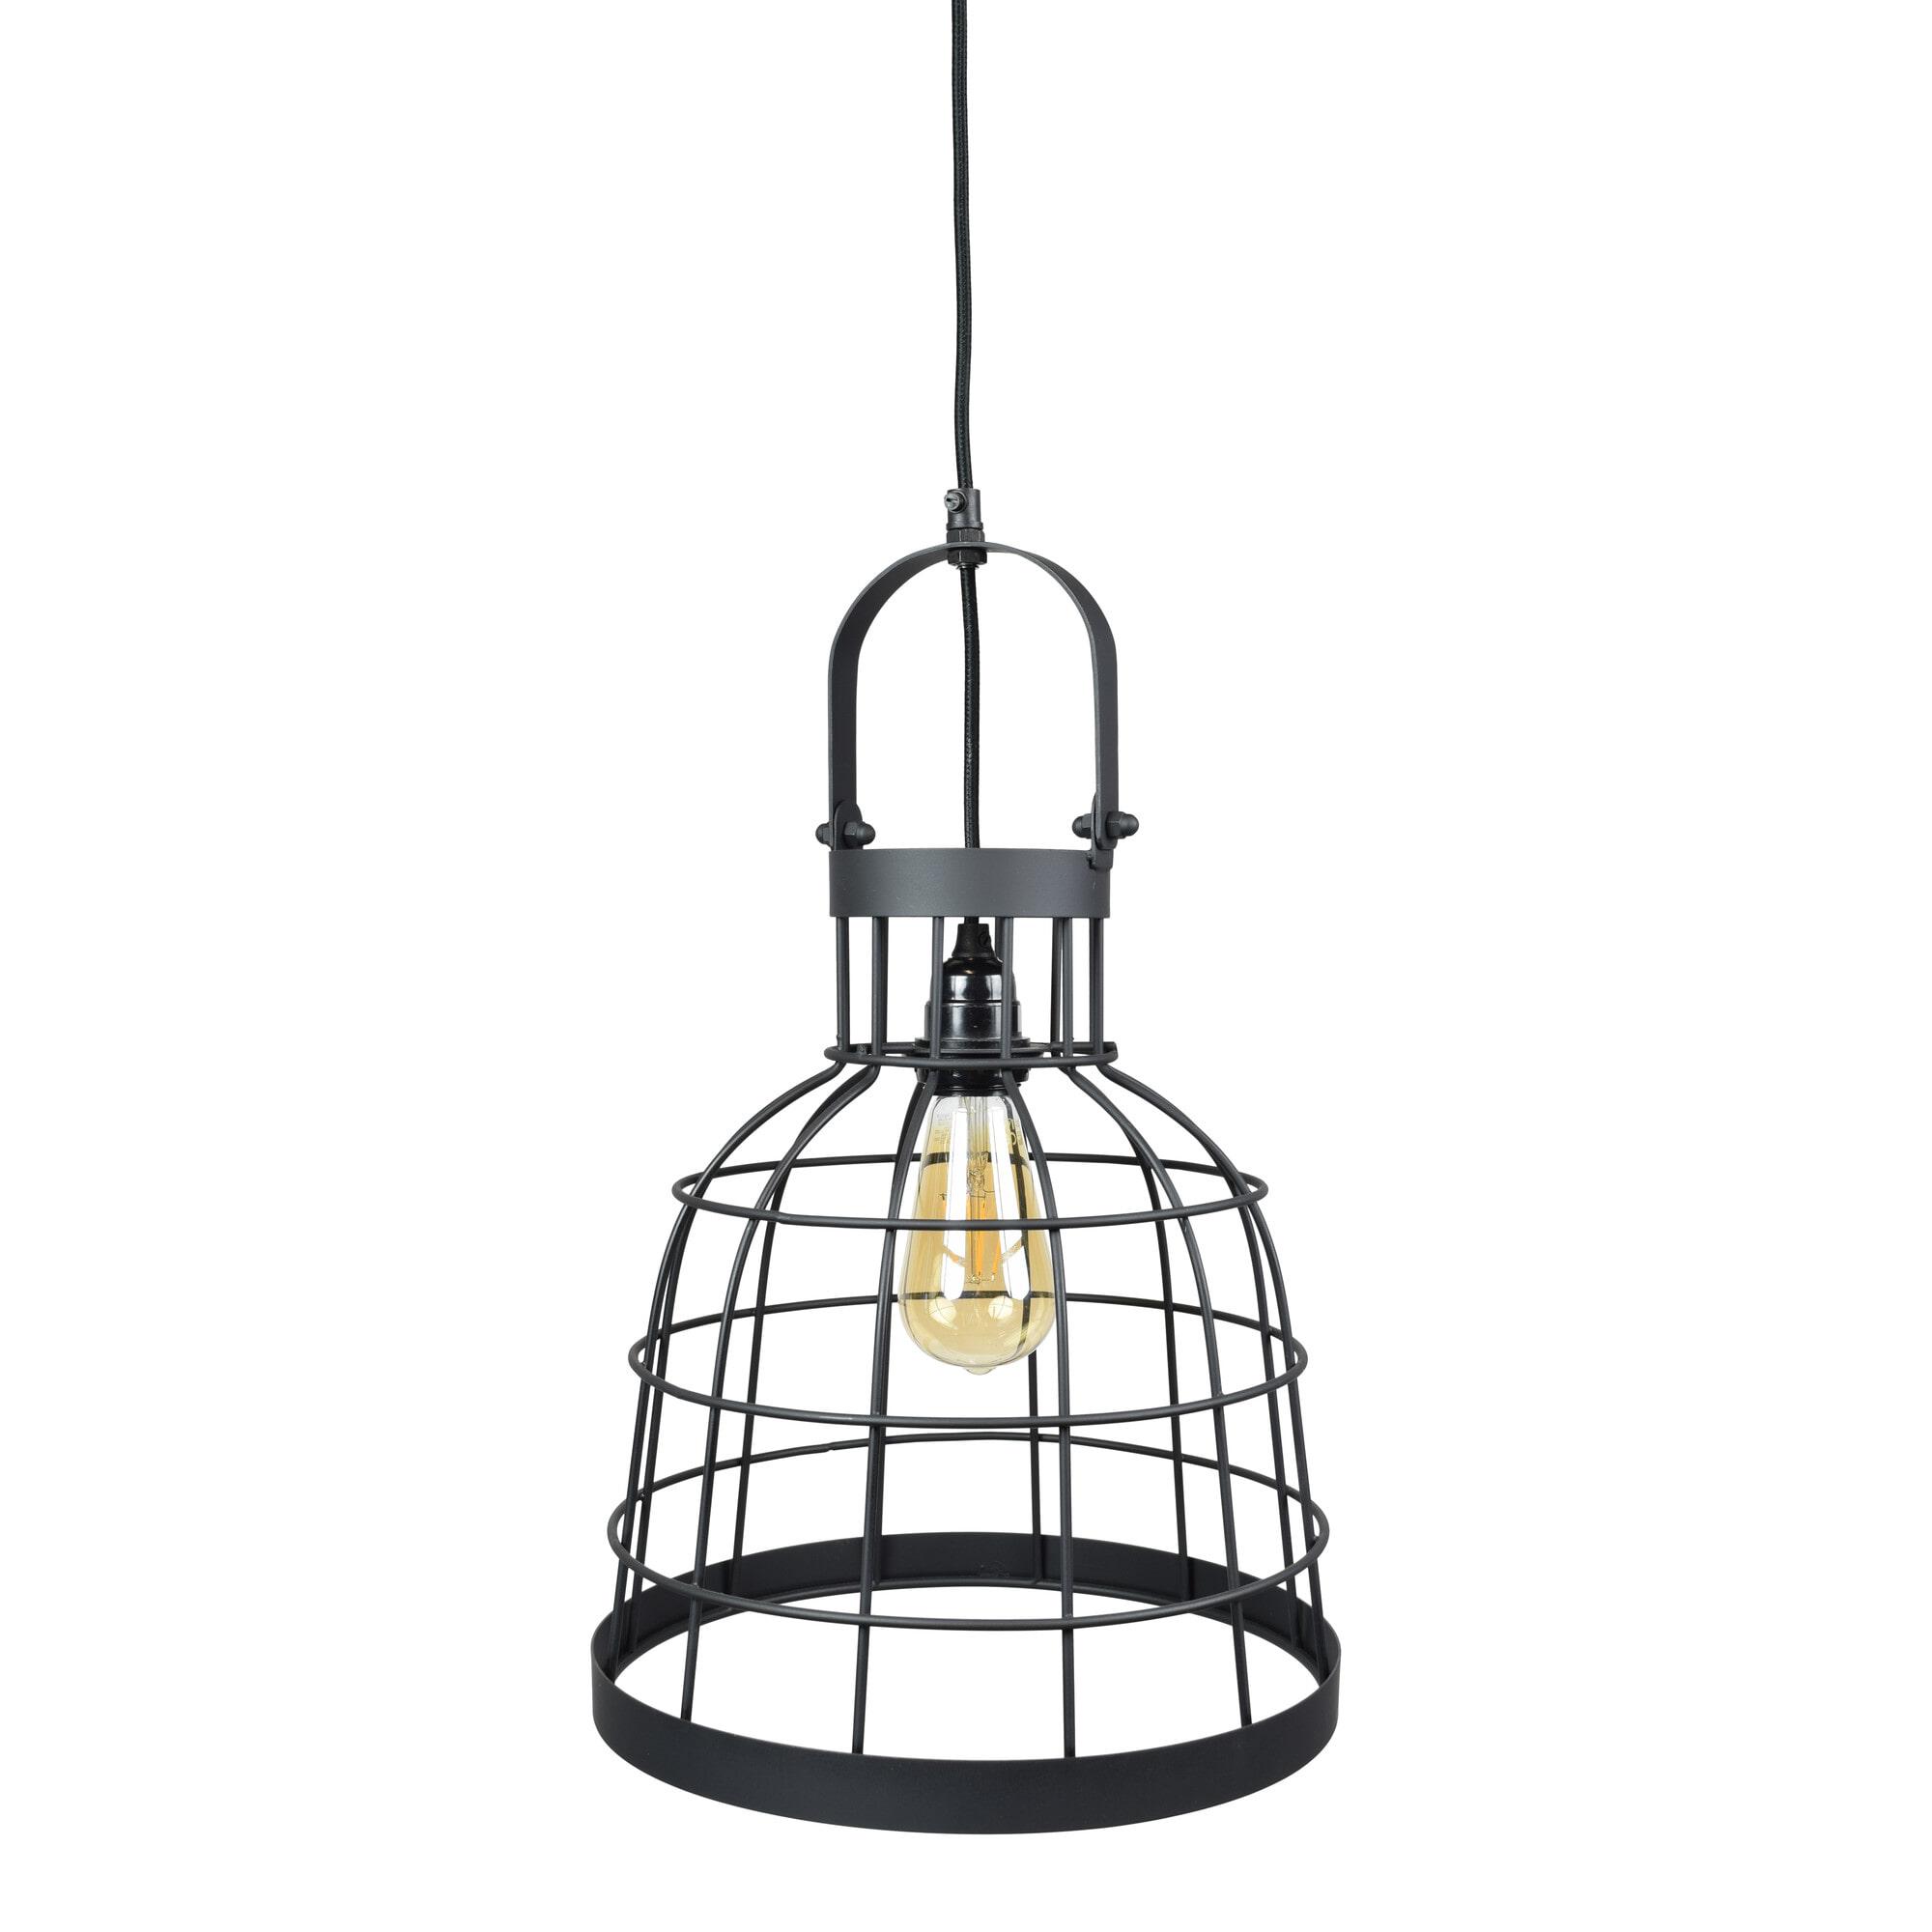 Urban Interiors hanglamp 'Bucket Large' 30cm, Black